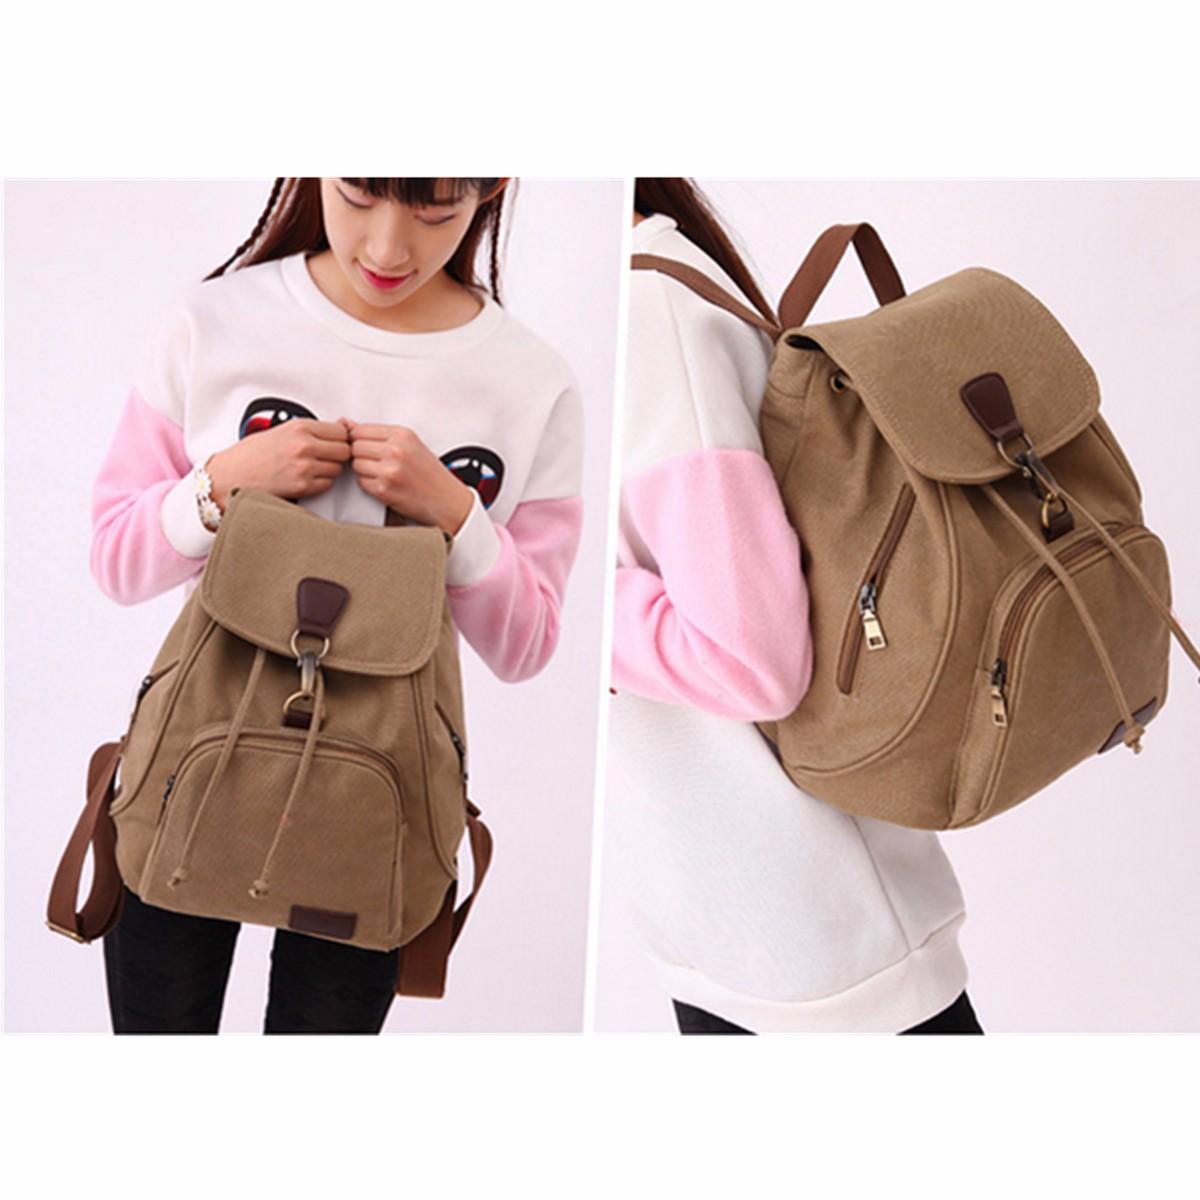 Women Men Canvas Travel Satchel Shoulder Bag Anti-theft Backpack School Rucksack Drawstring